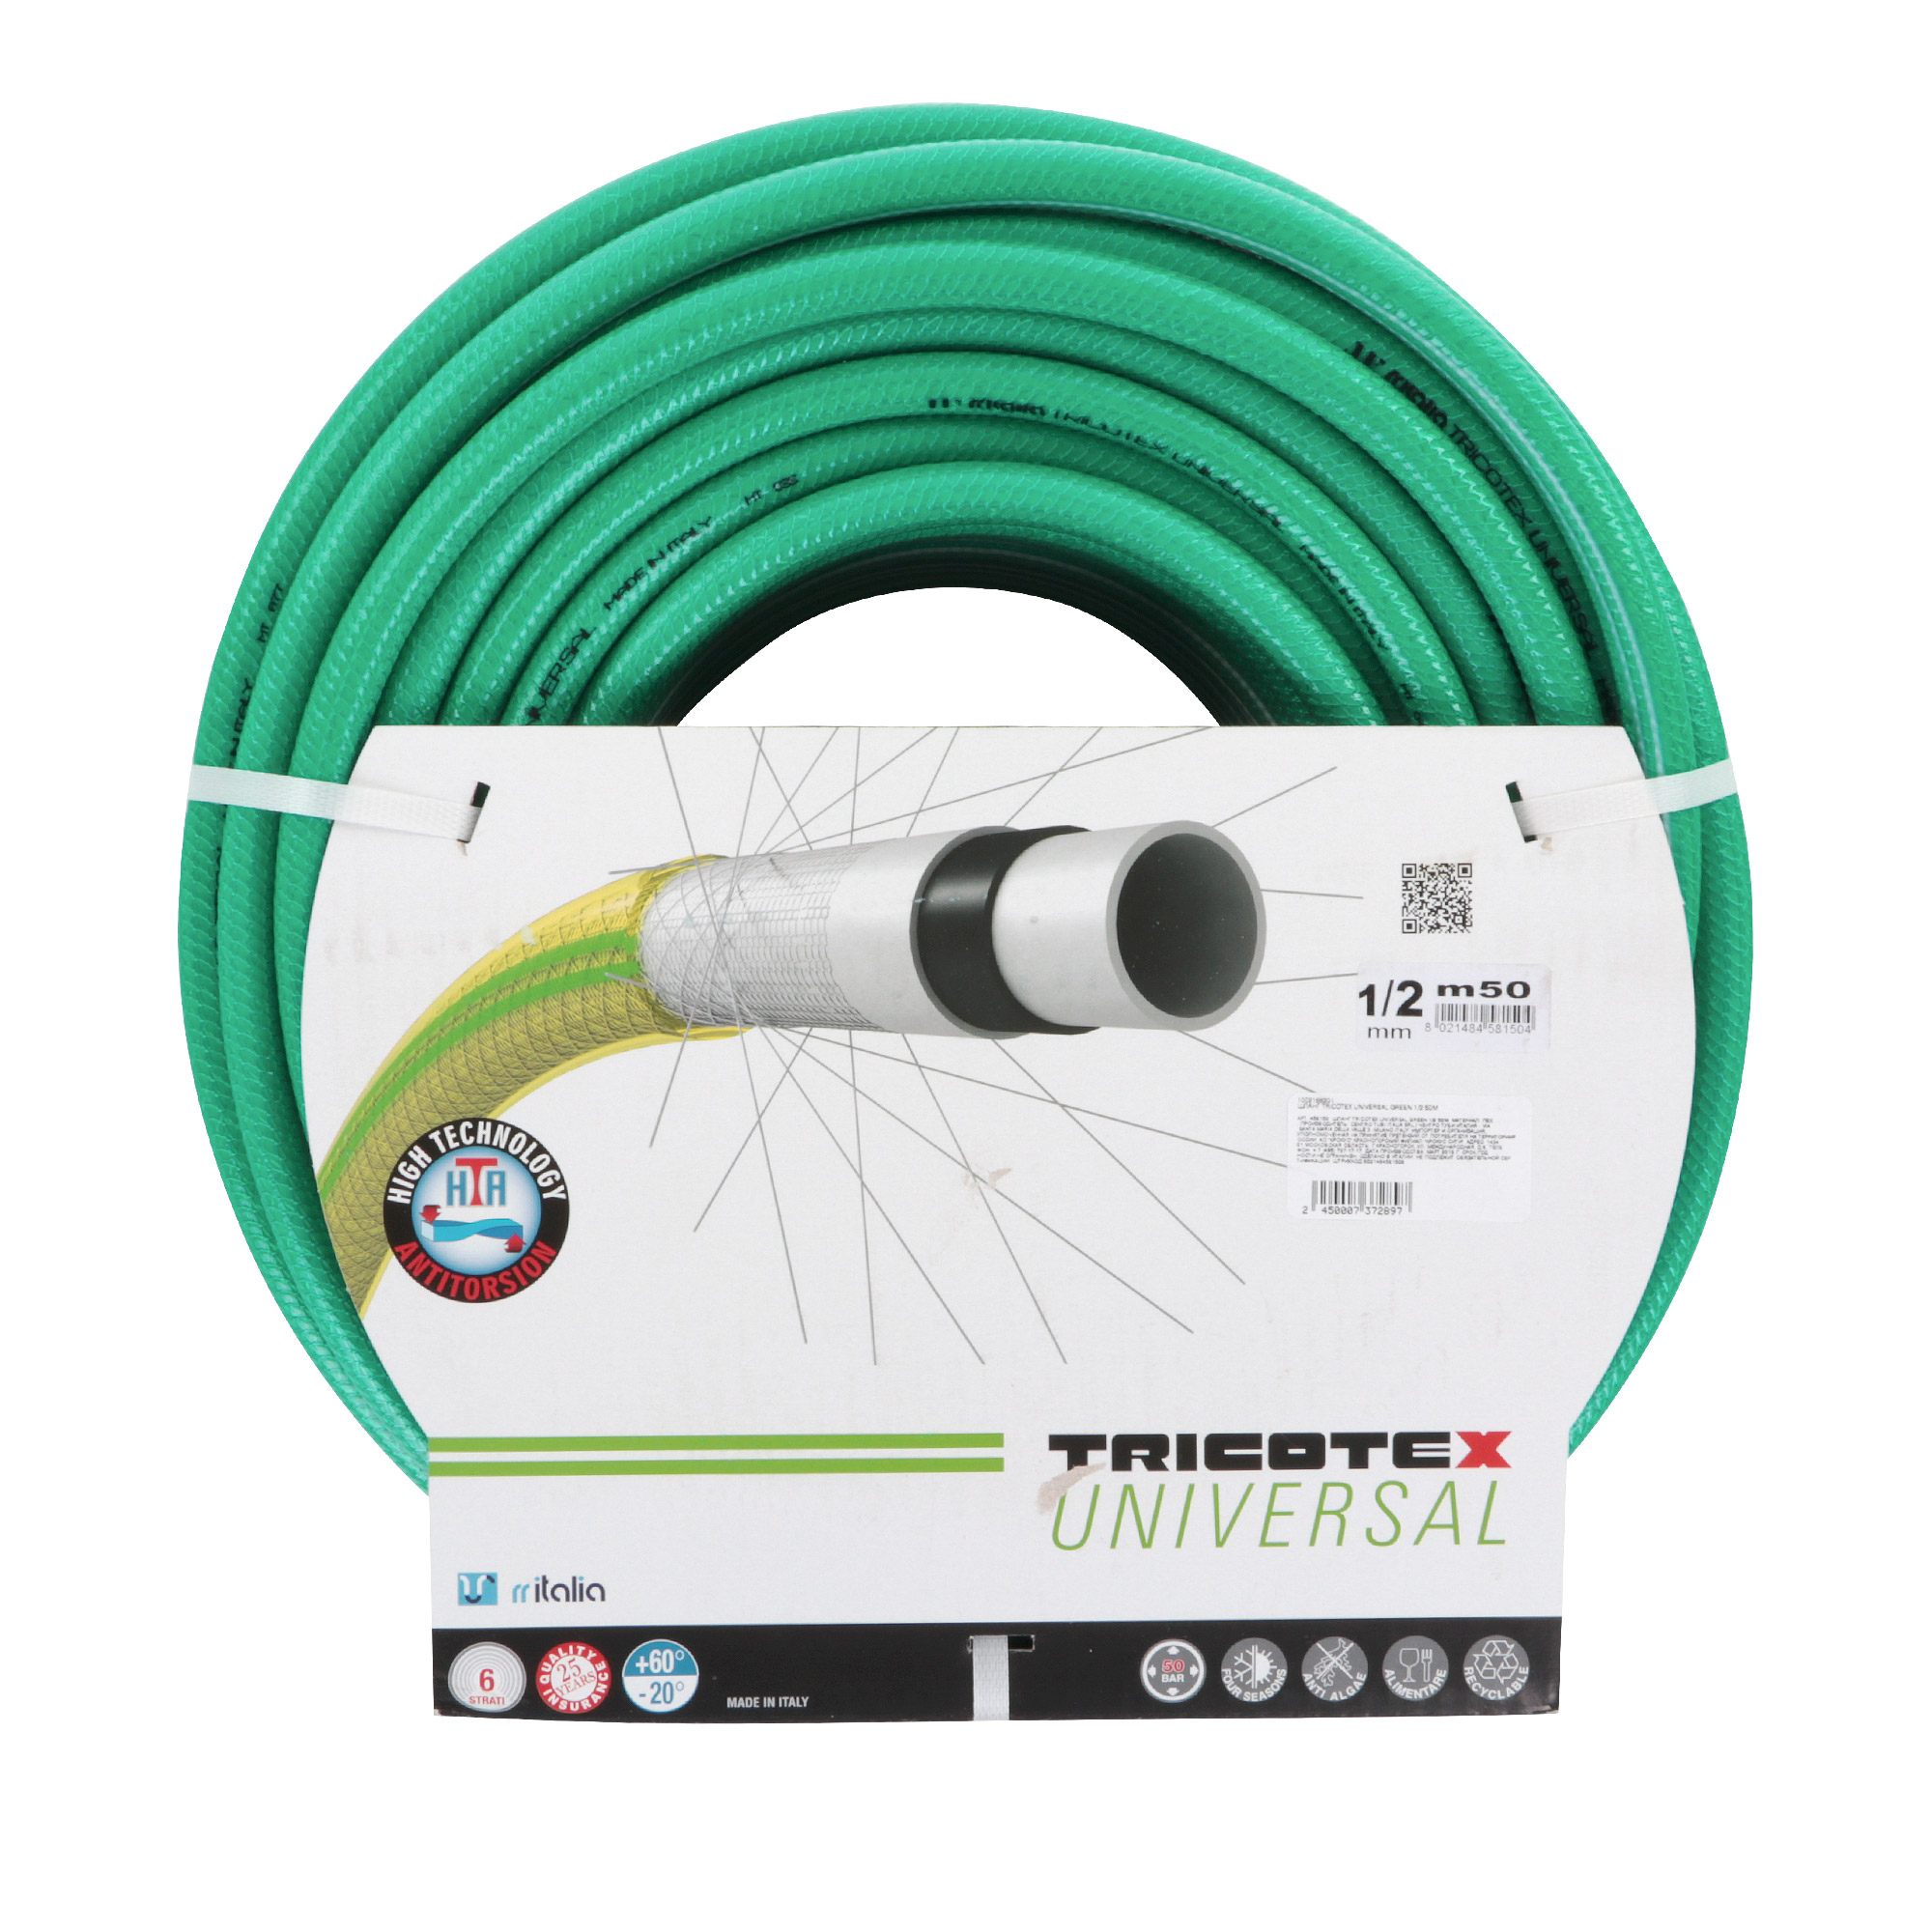 Шланг Rr italia tricotex universal green 1/2 50m катушка для шланга rr italia galvanised rr210